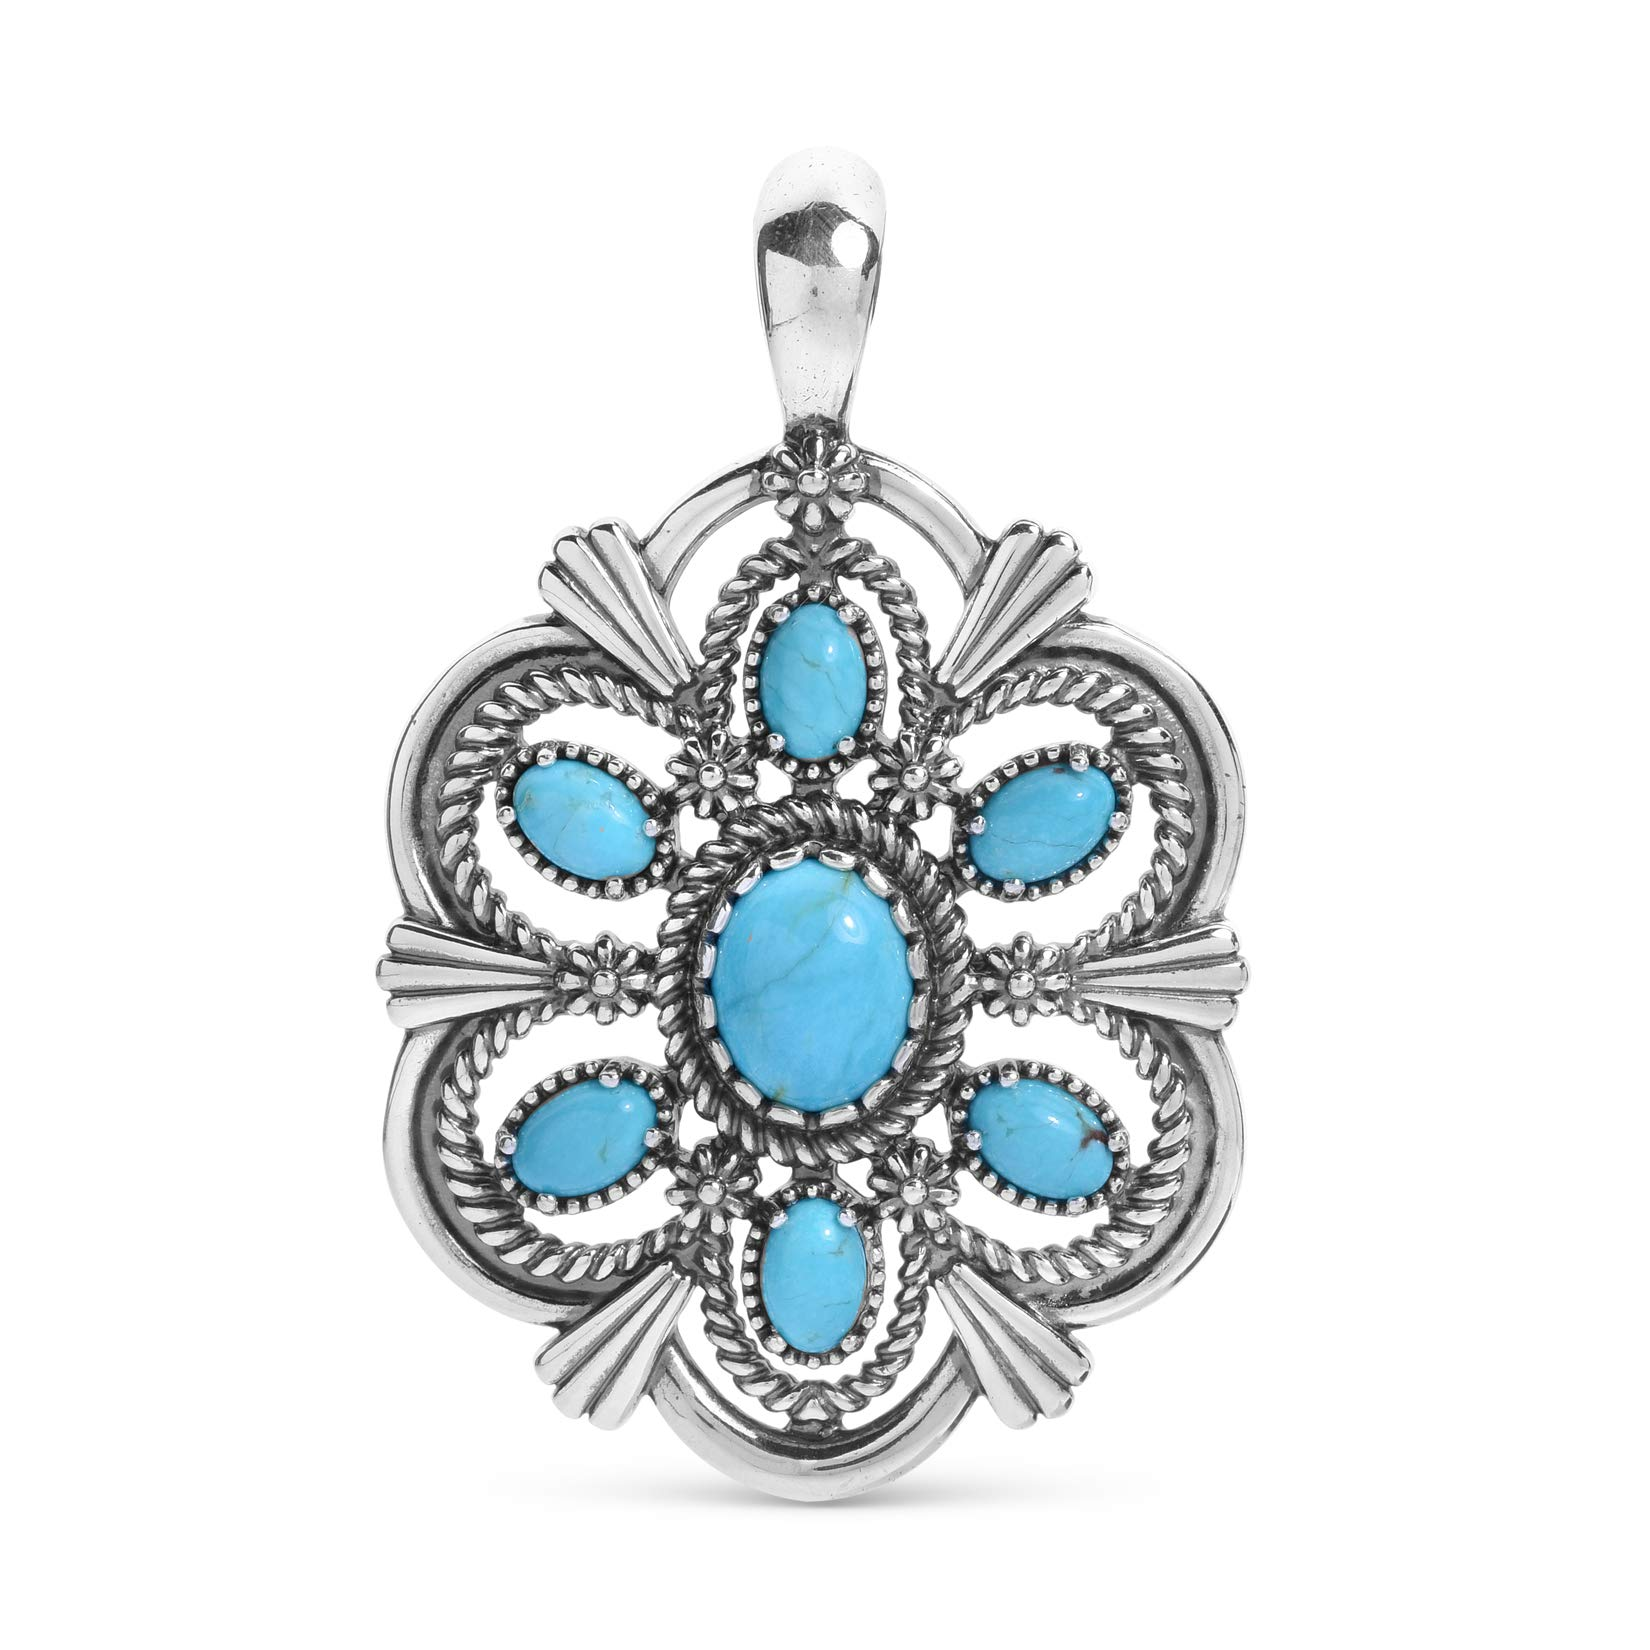 .925 Sterling Silver Blue Turquoise Gemstone 2-1/8'' Clip-On Necklace Enhancer Pendant